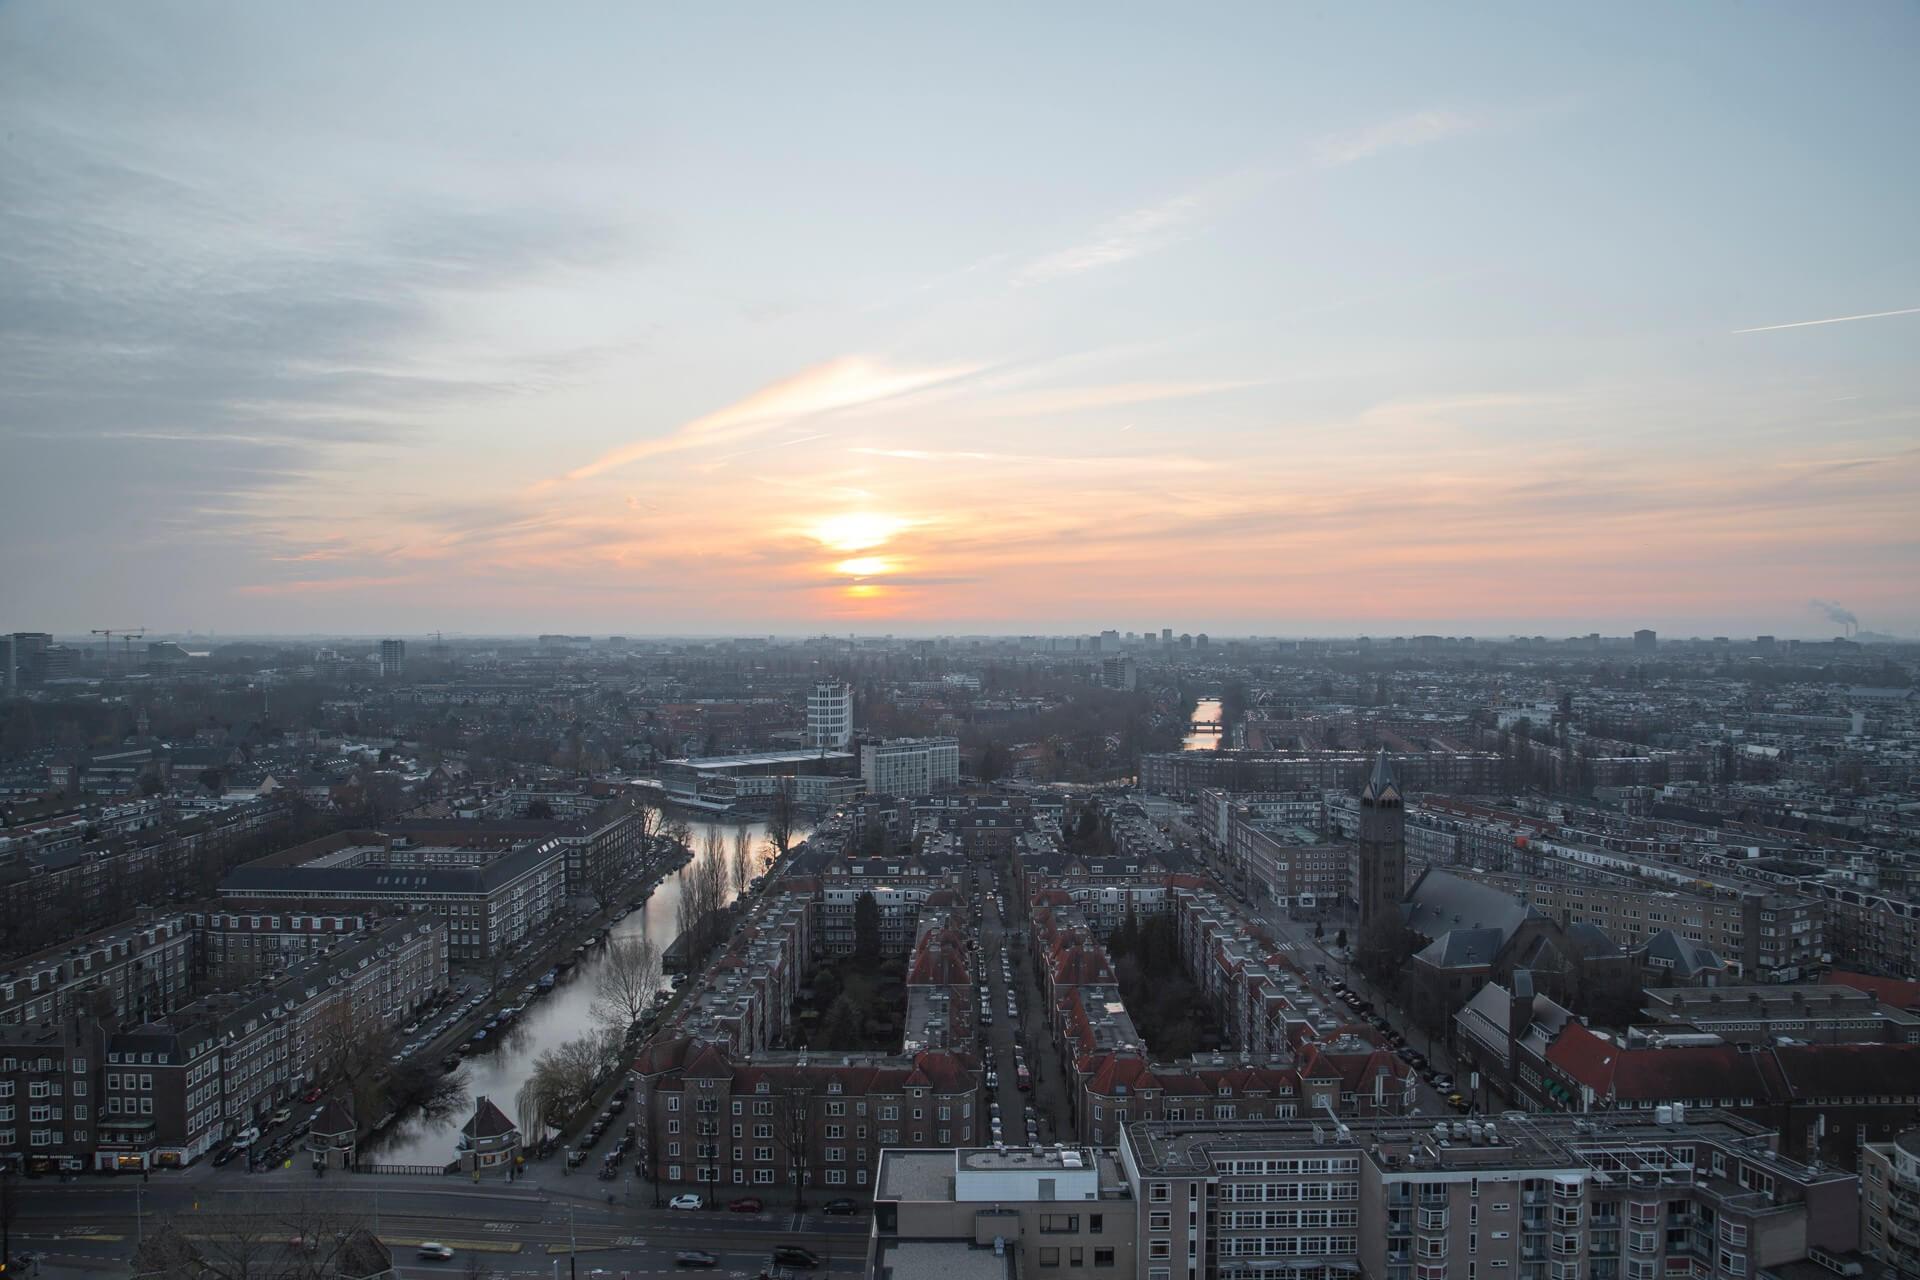 Evening glow view from Hotel Okura Amsterdam